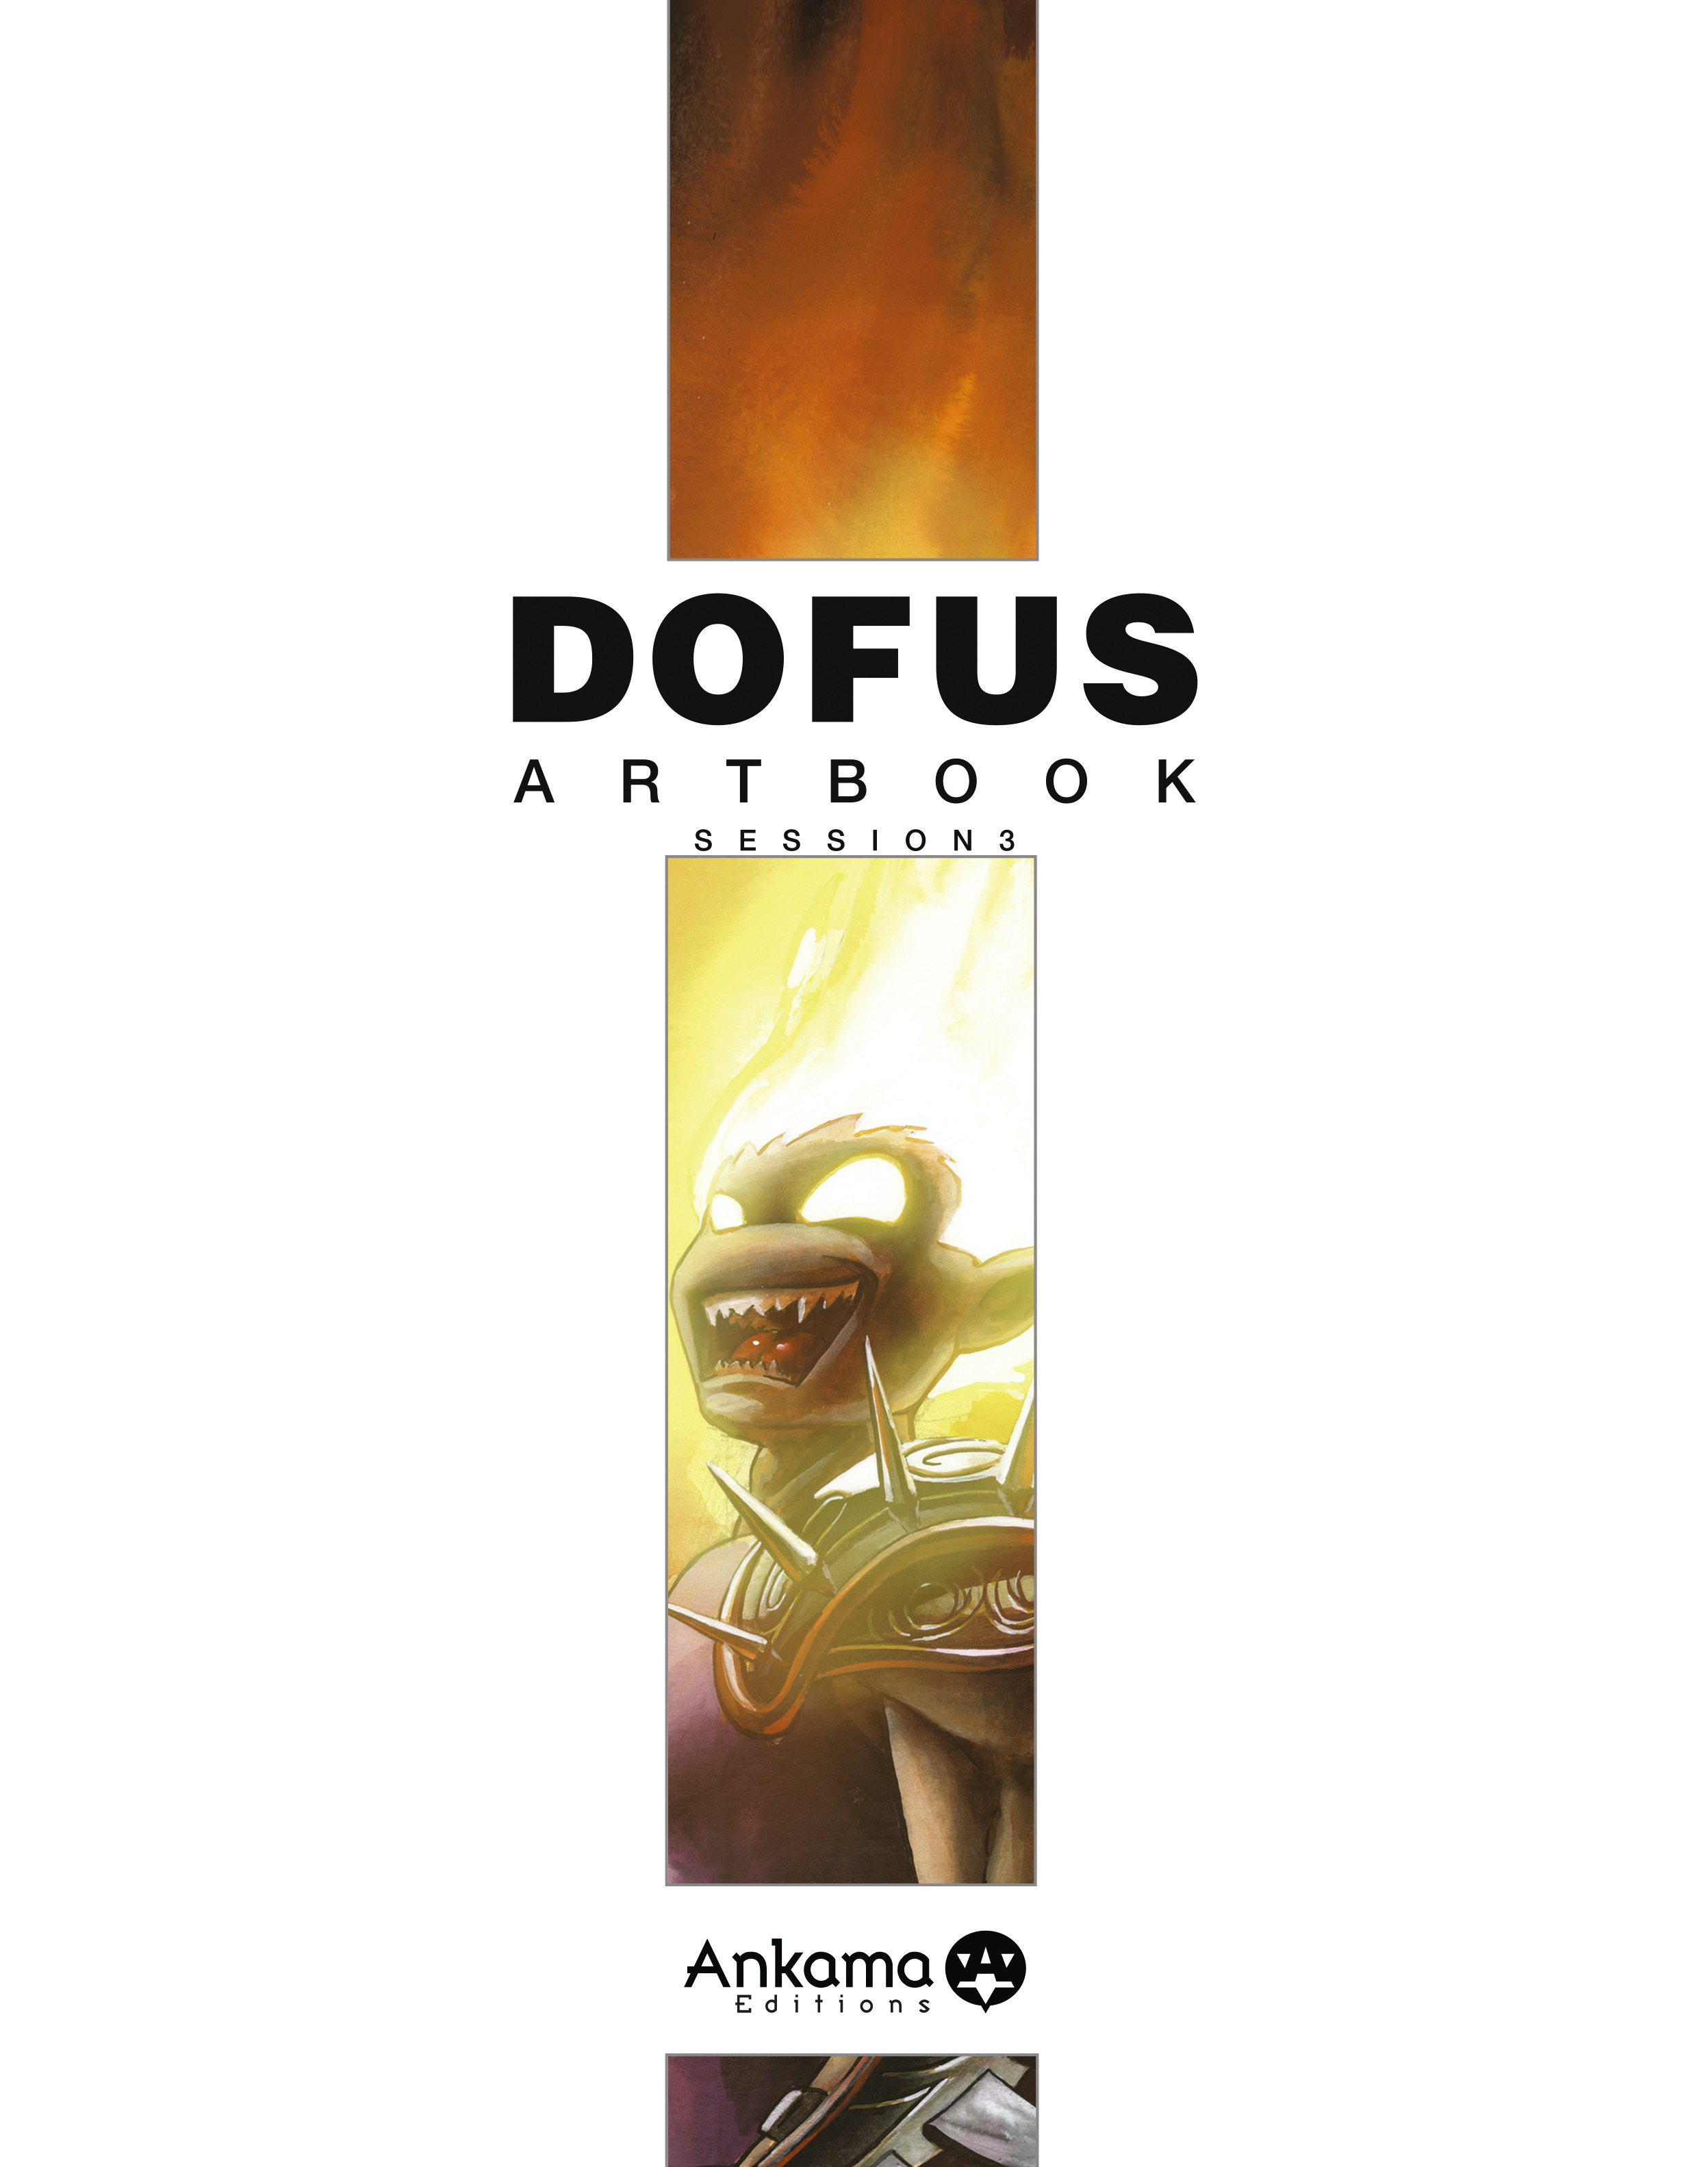 DOFUS ARTBOOK-SESSION 3